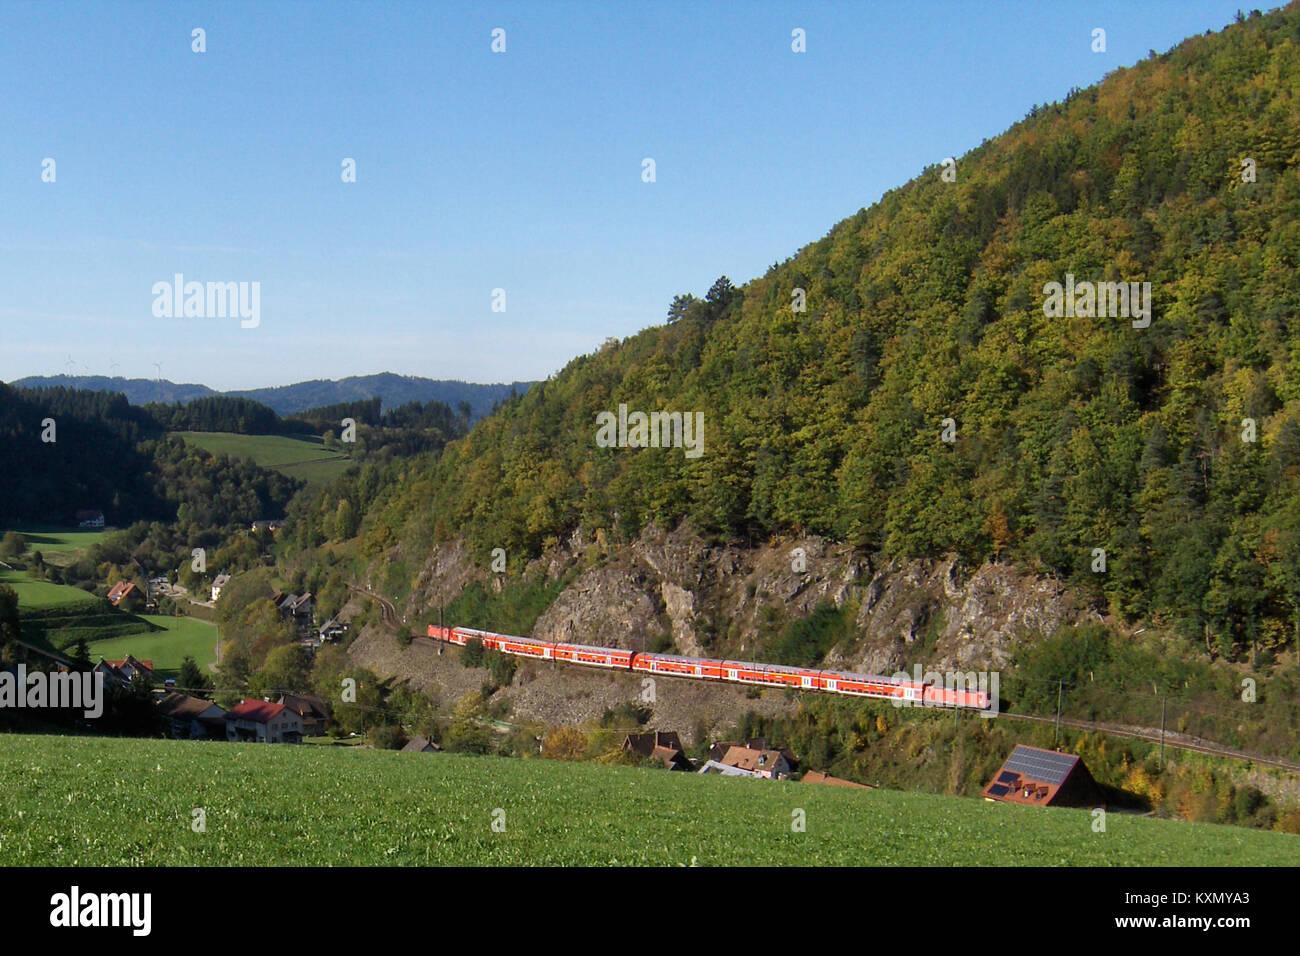 Blick in Falkensteig mit einem Doppelstockzug der Höllentalbahn Stockbild